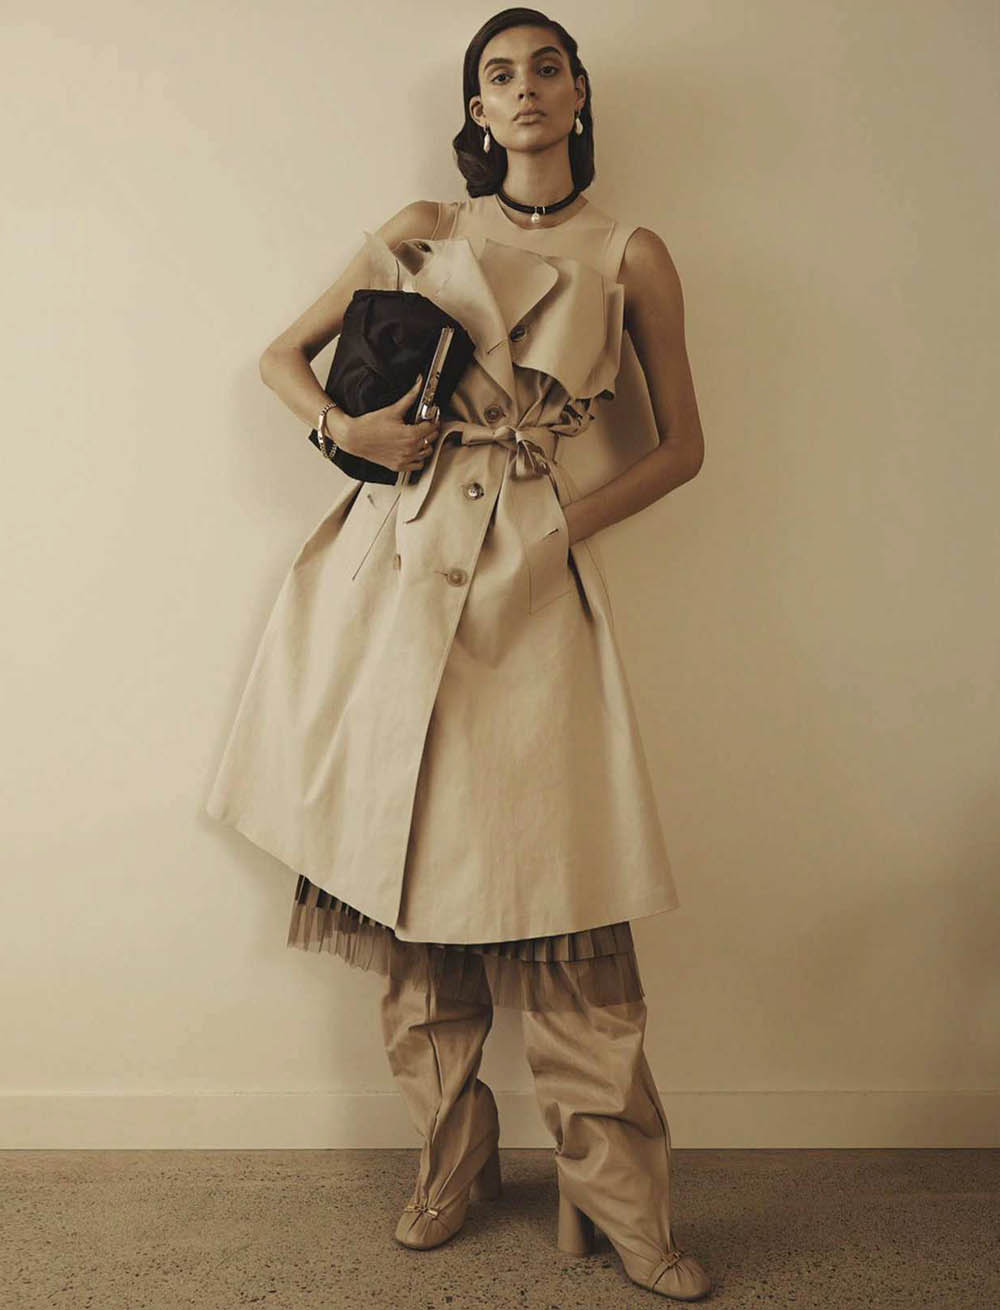 Charlee Fraser by Emma Summerton for Vogue Australia May 2018